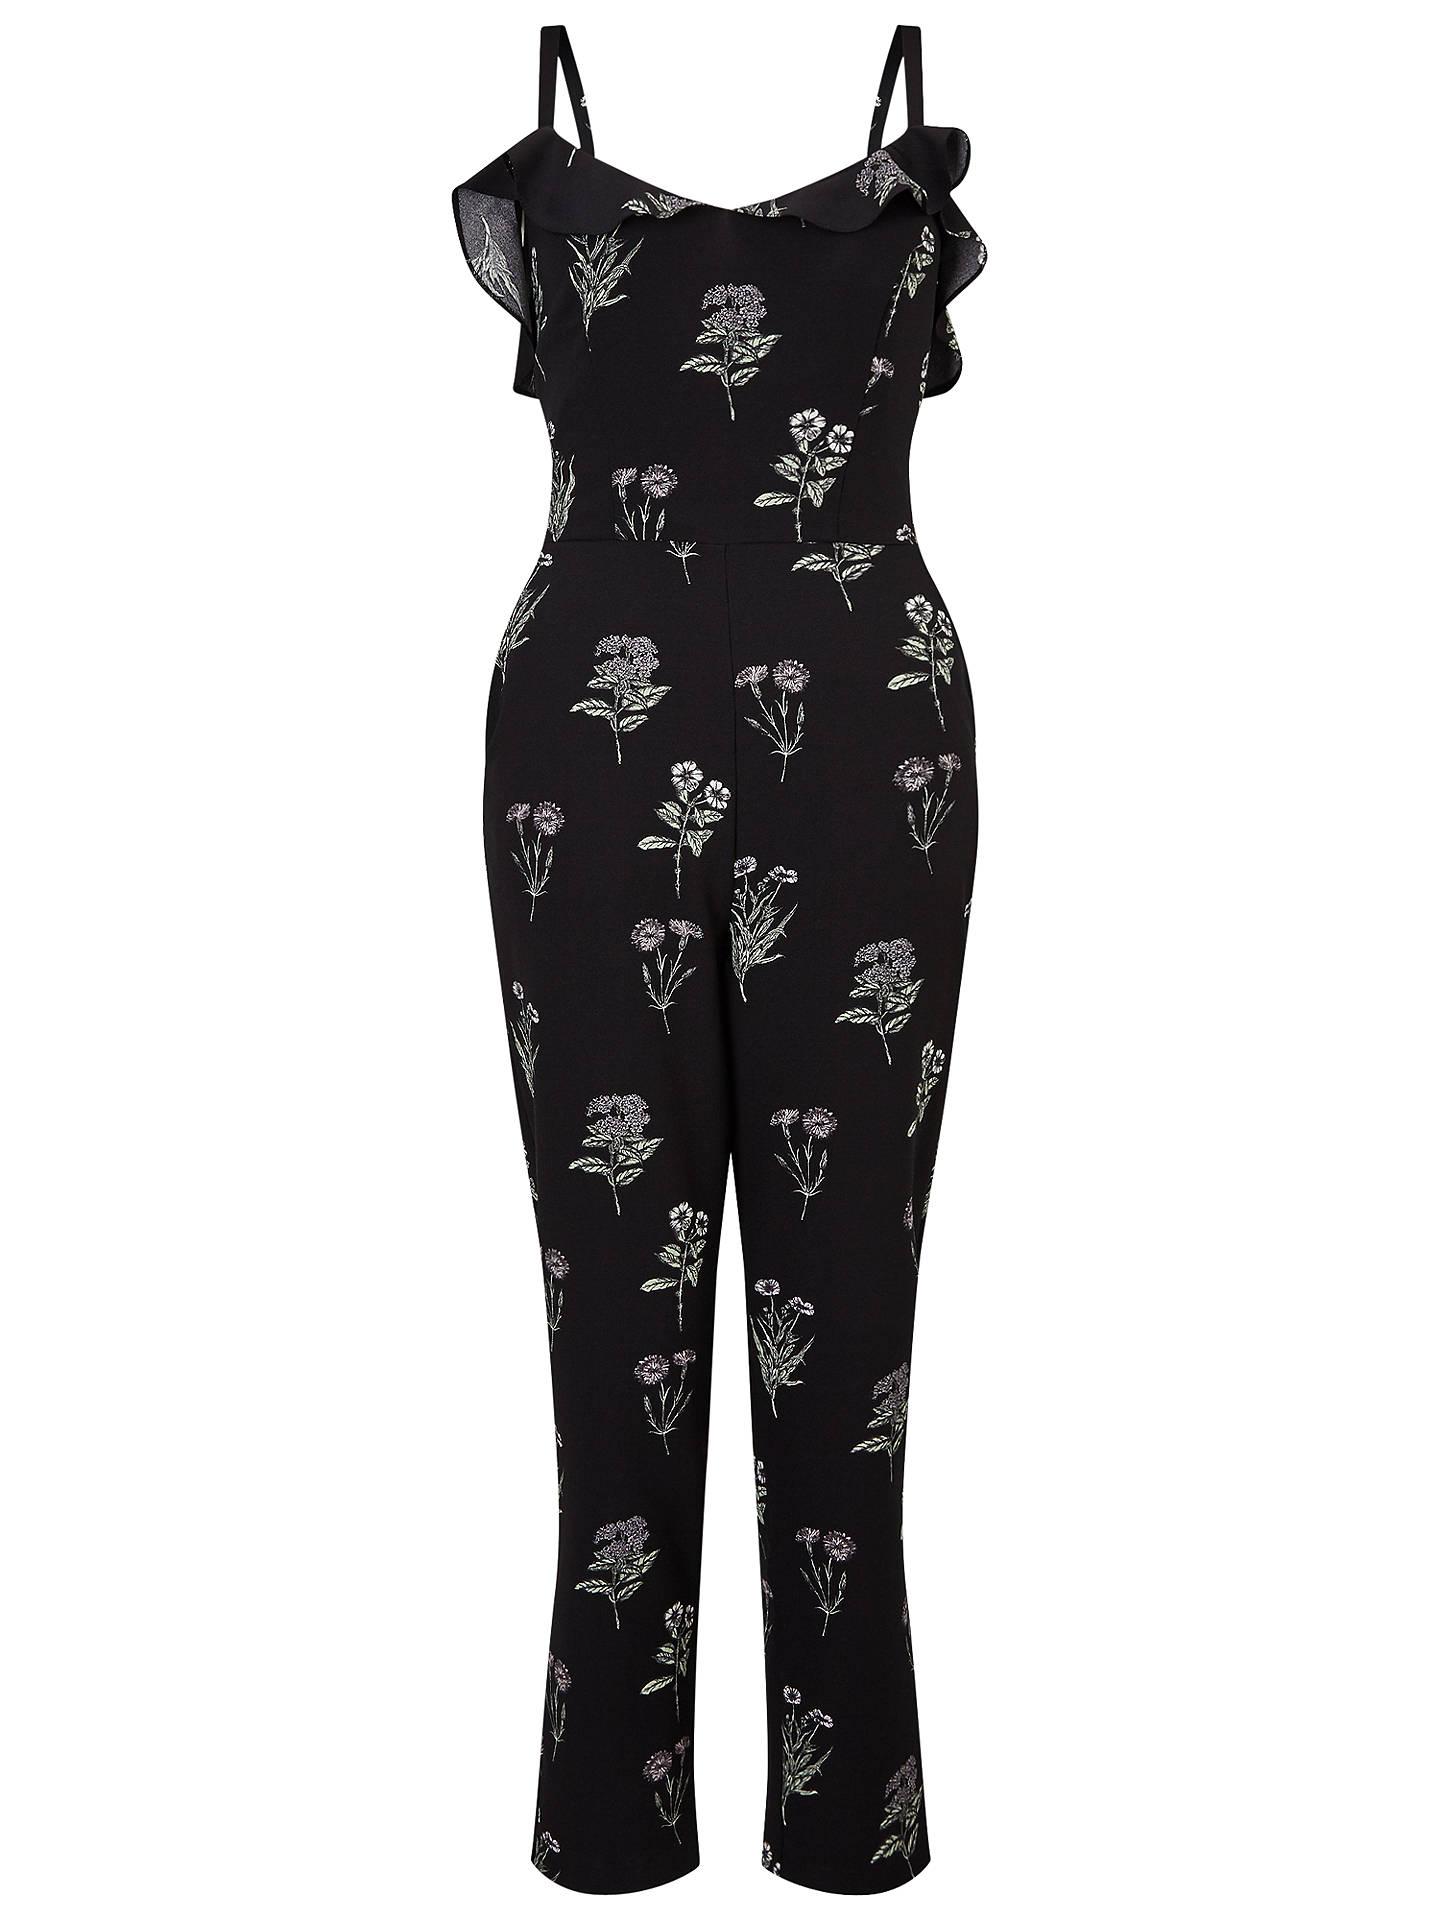 085fe8a16e Buy Miss Selfridge Ruffle Strap Jumpsuit